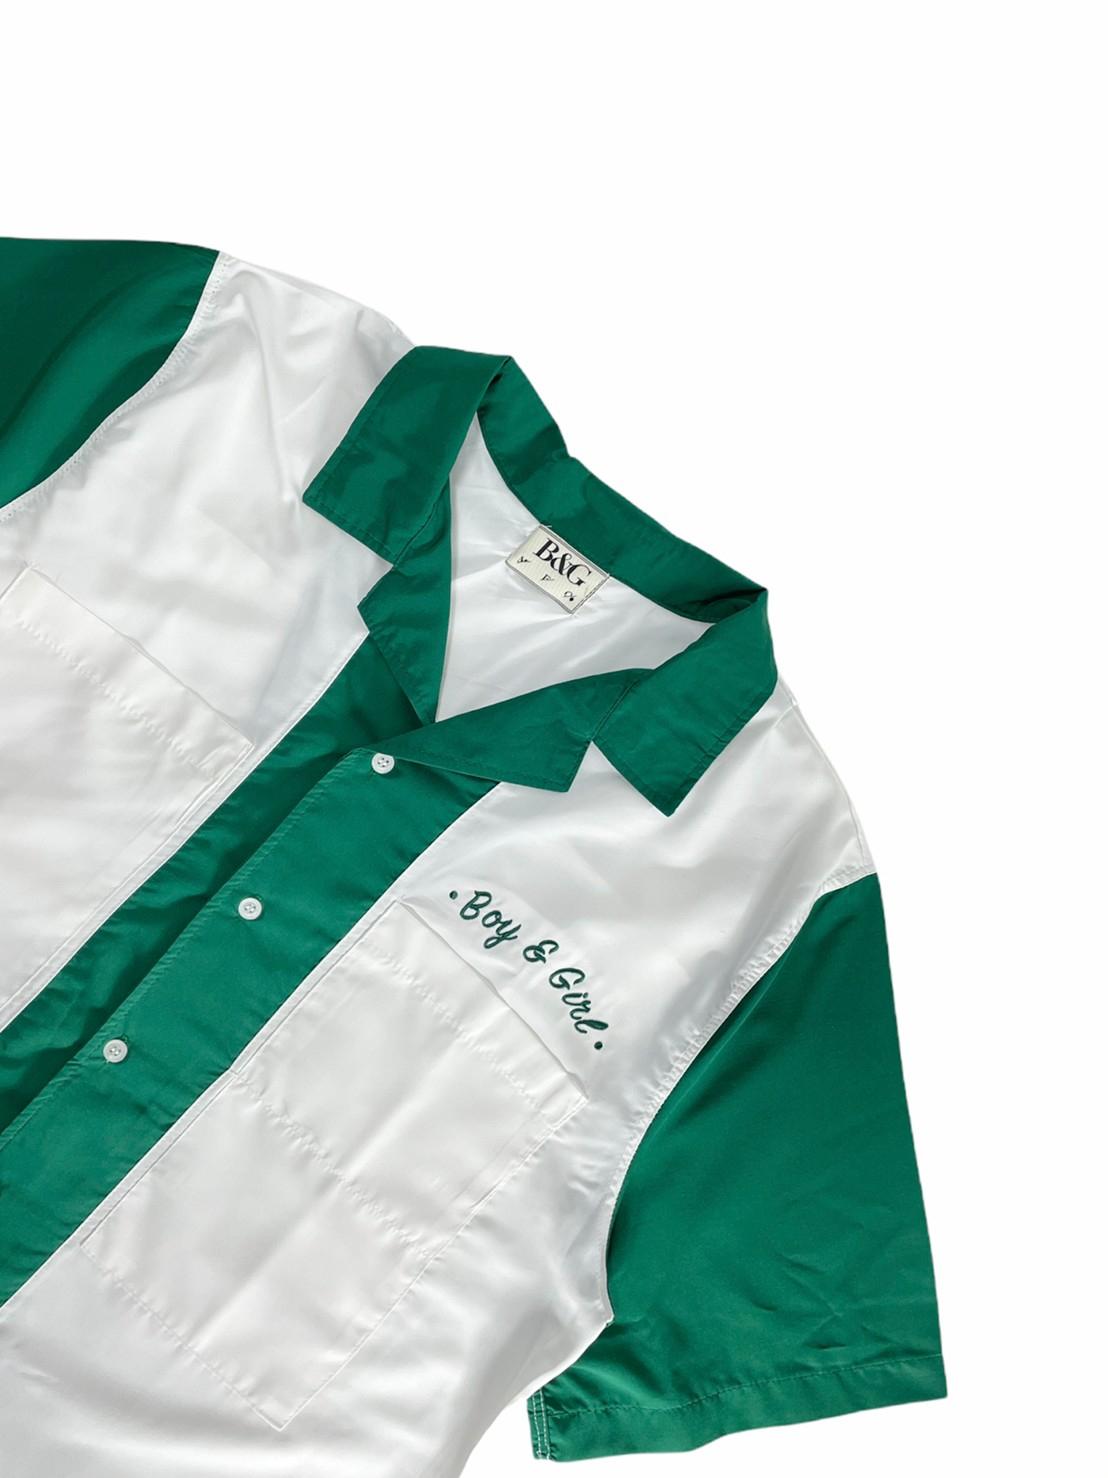 B & G Retro Shirt (Green)